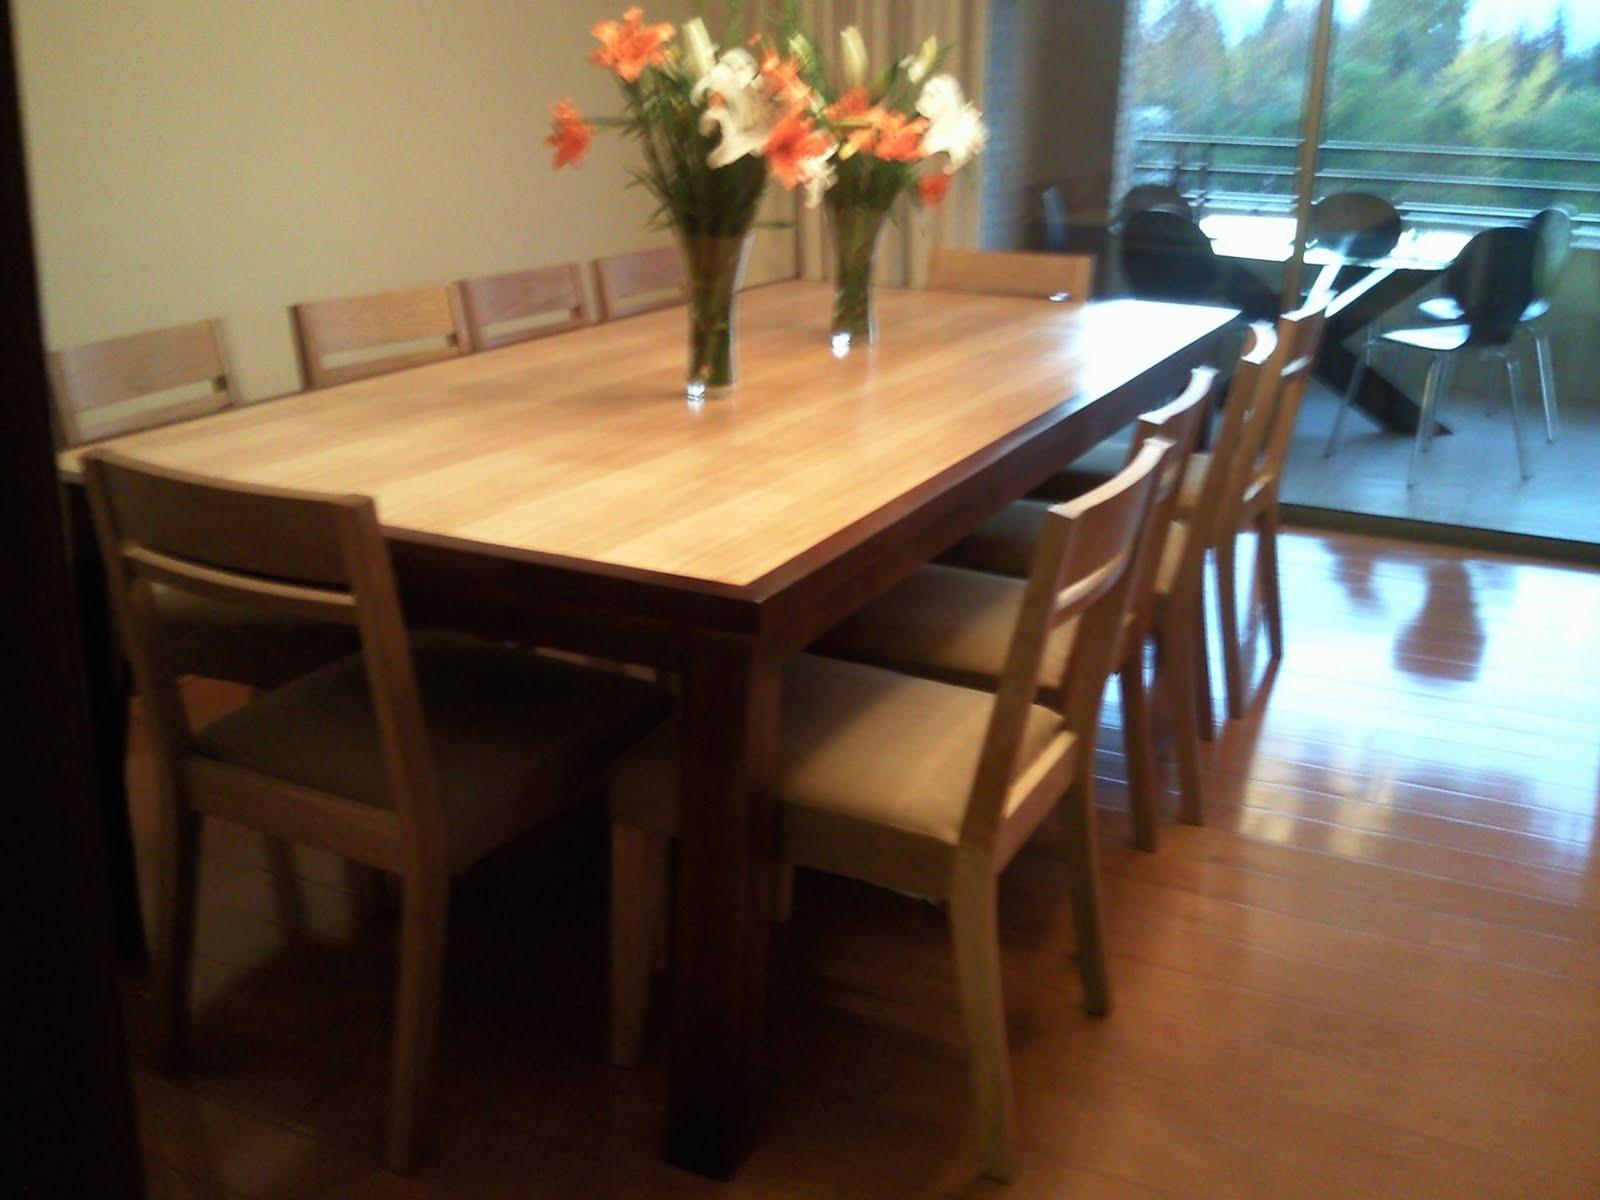 Mesa comedor muebles sanchez for Comedores en famsa